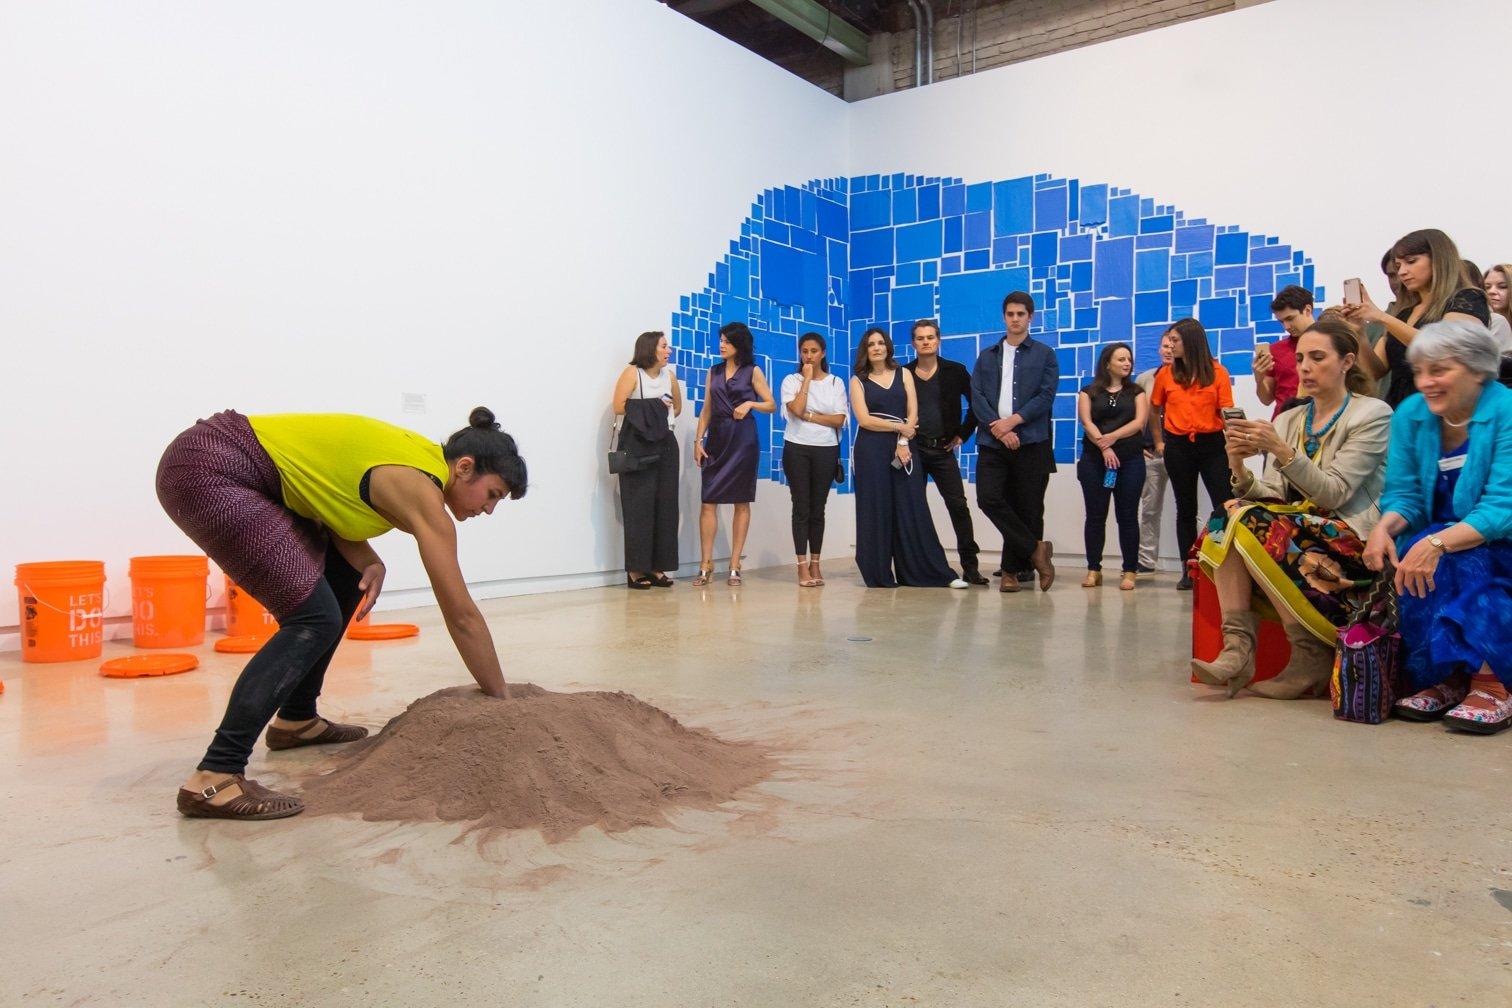 Performance view (featuring Marcela Calderón Bony)